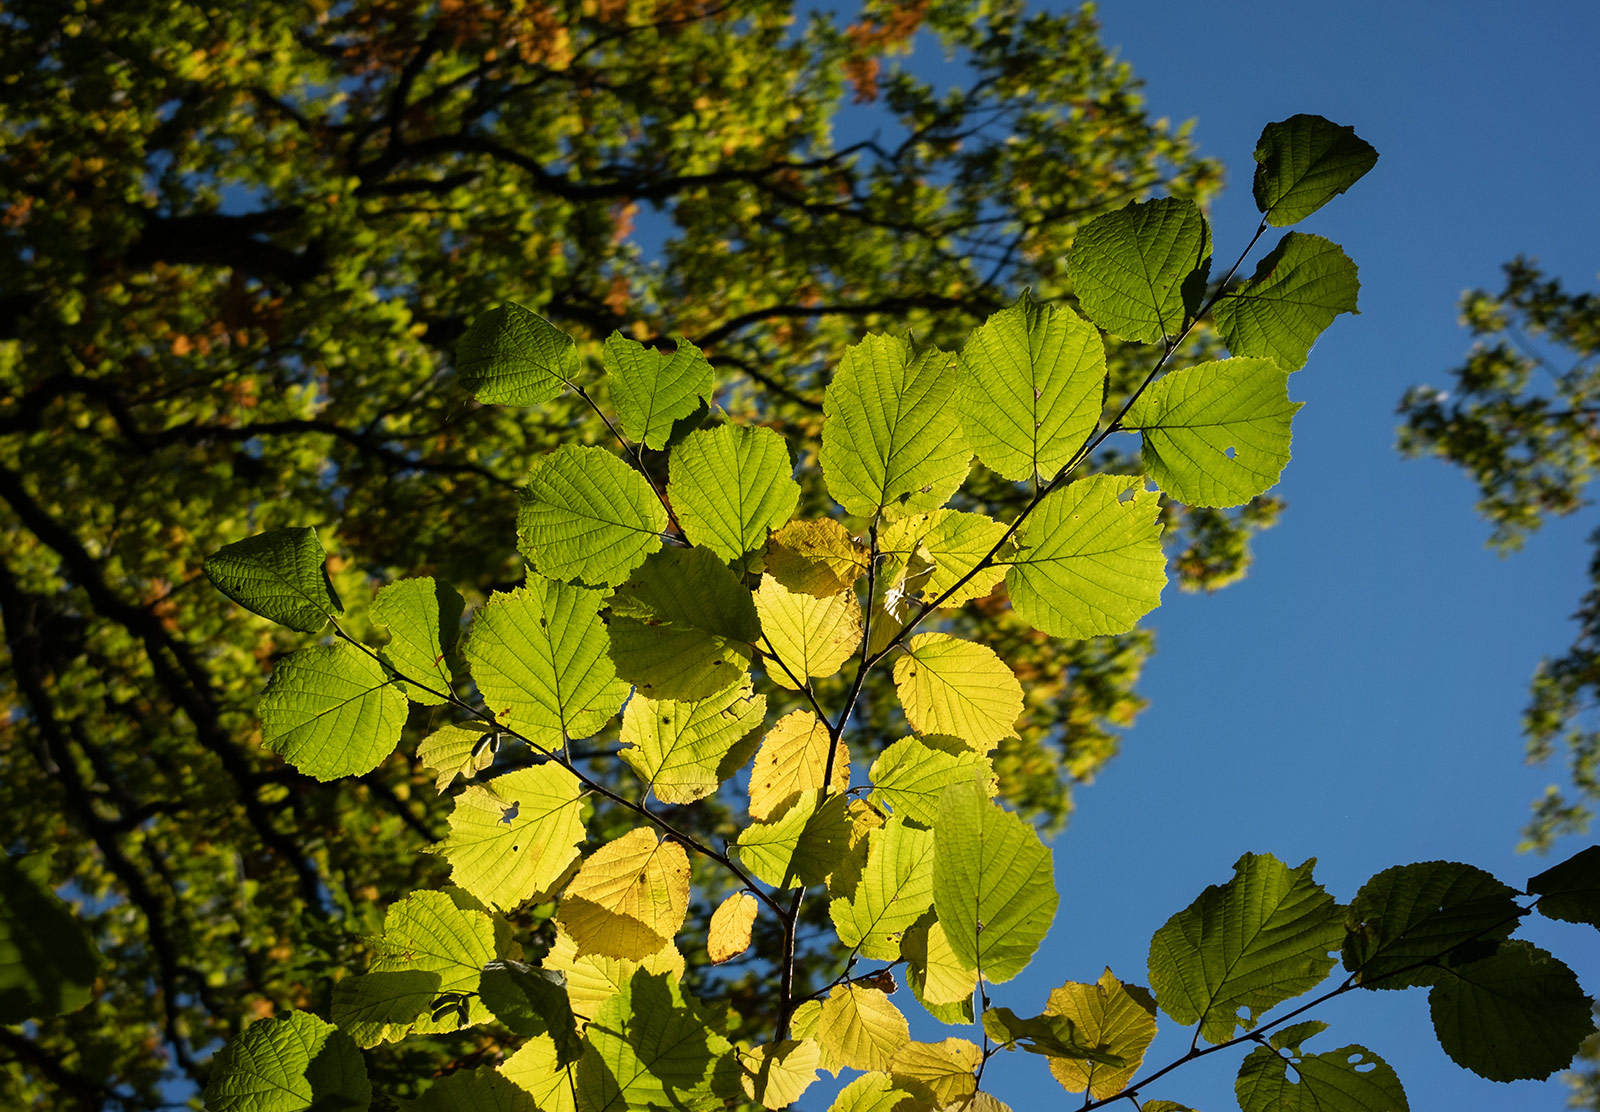 Leaves turning yellow